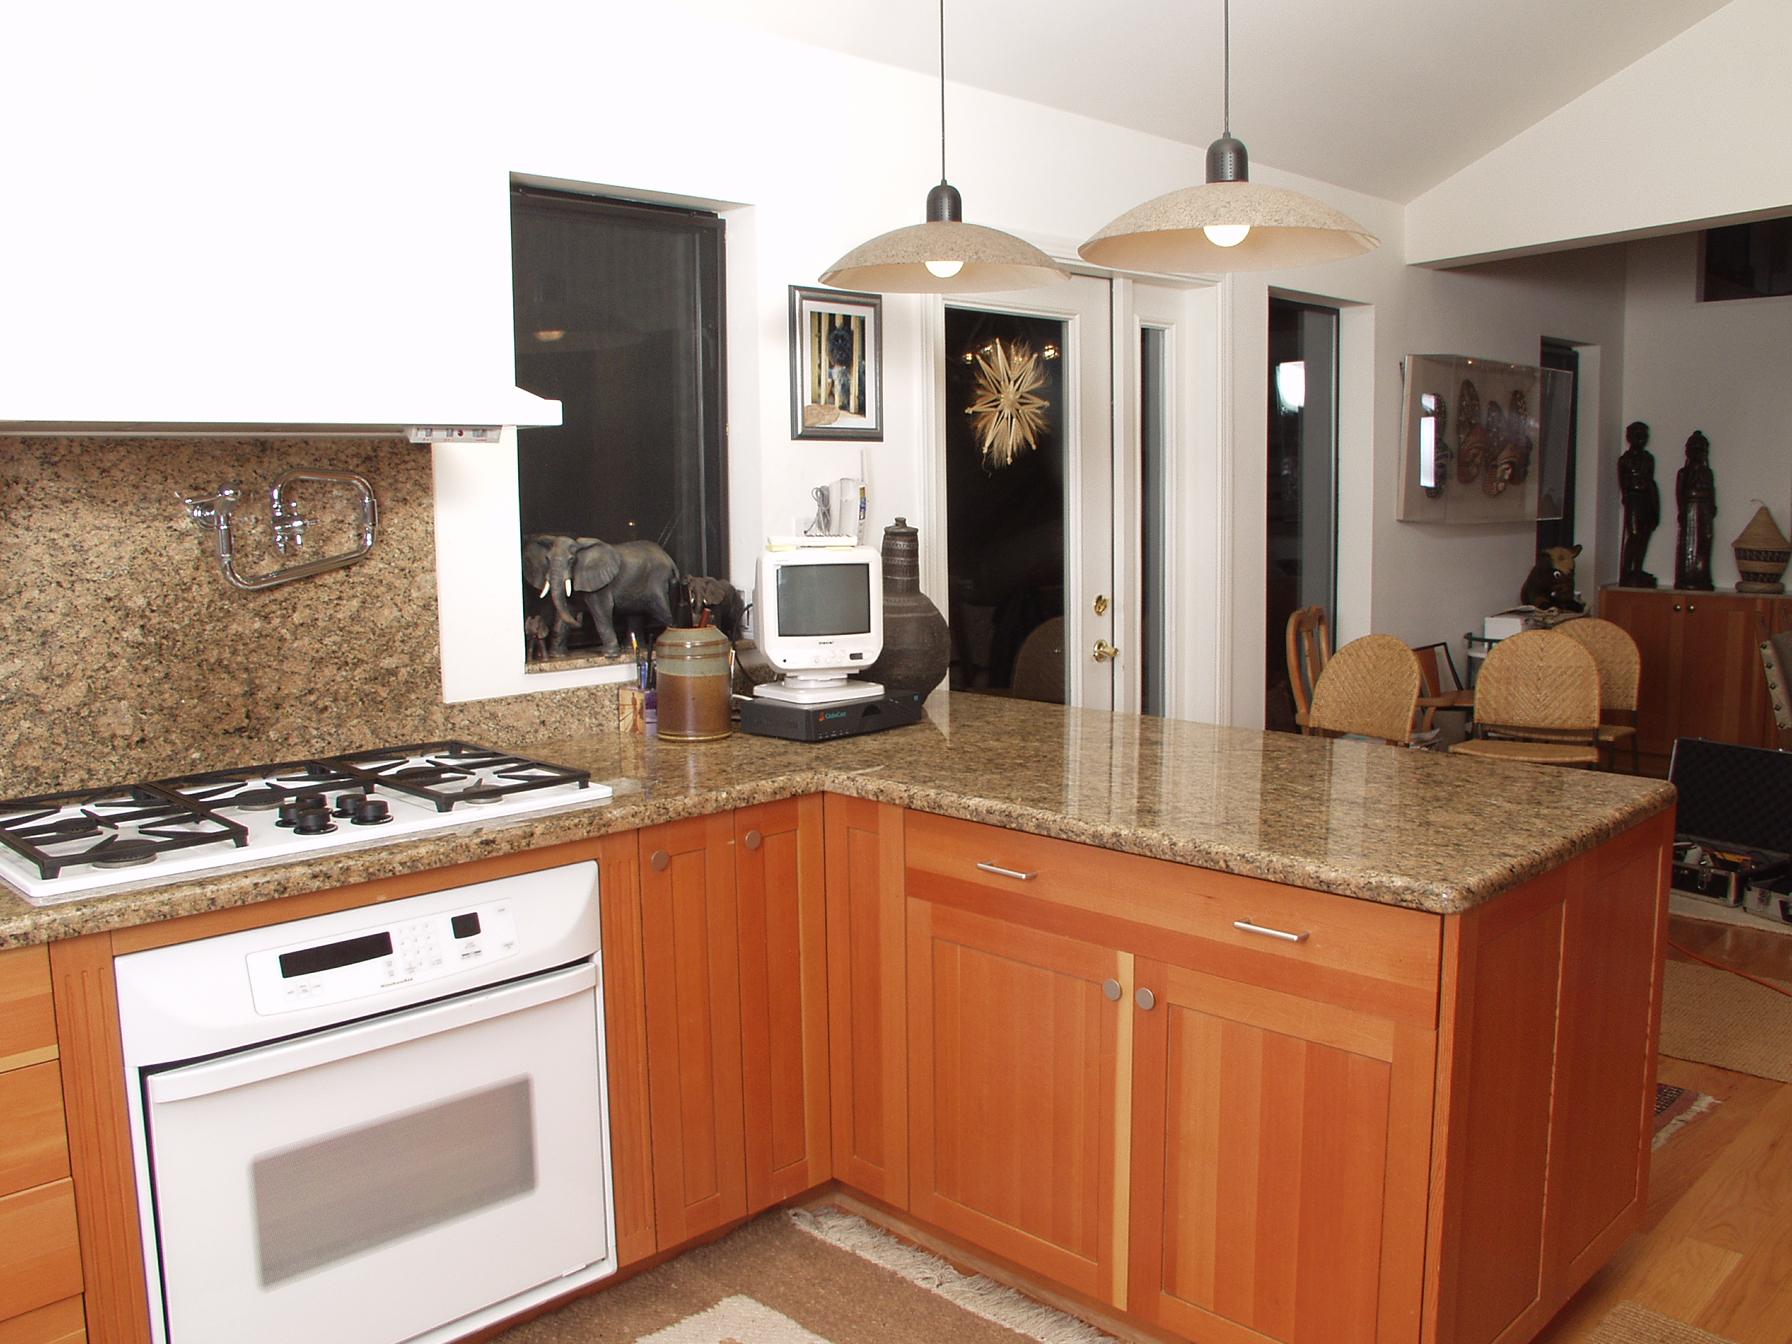 kitchen in giallo veneziano oven.JPG